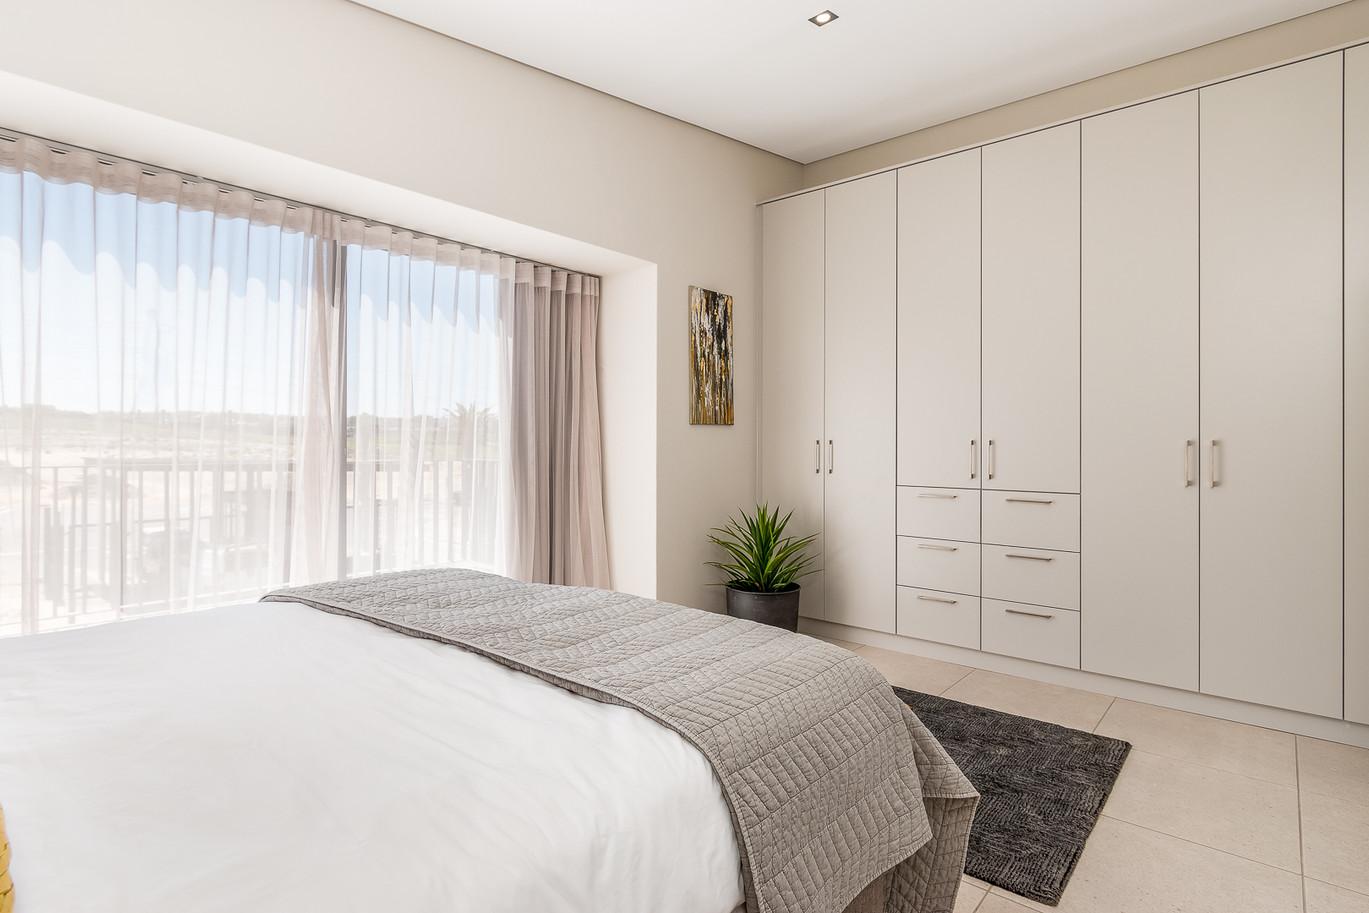 Greystone Master Bedroom 2